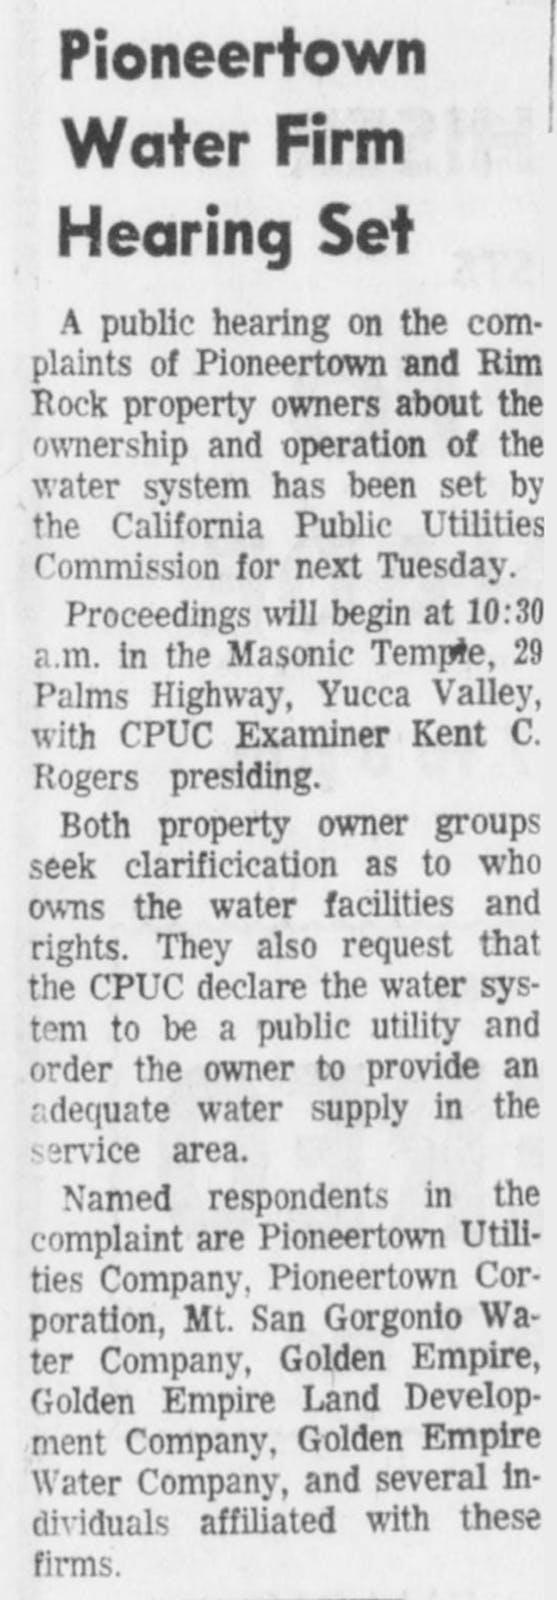 Feb. 22, 1967 - The Desert Sun article clipping